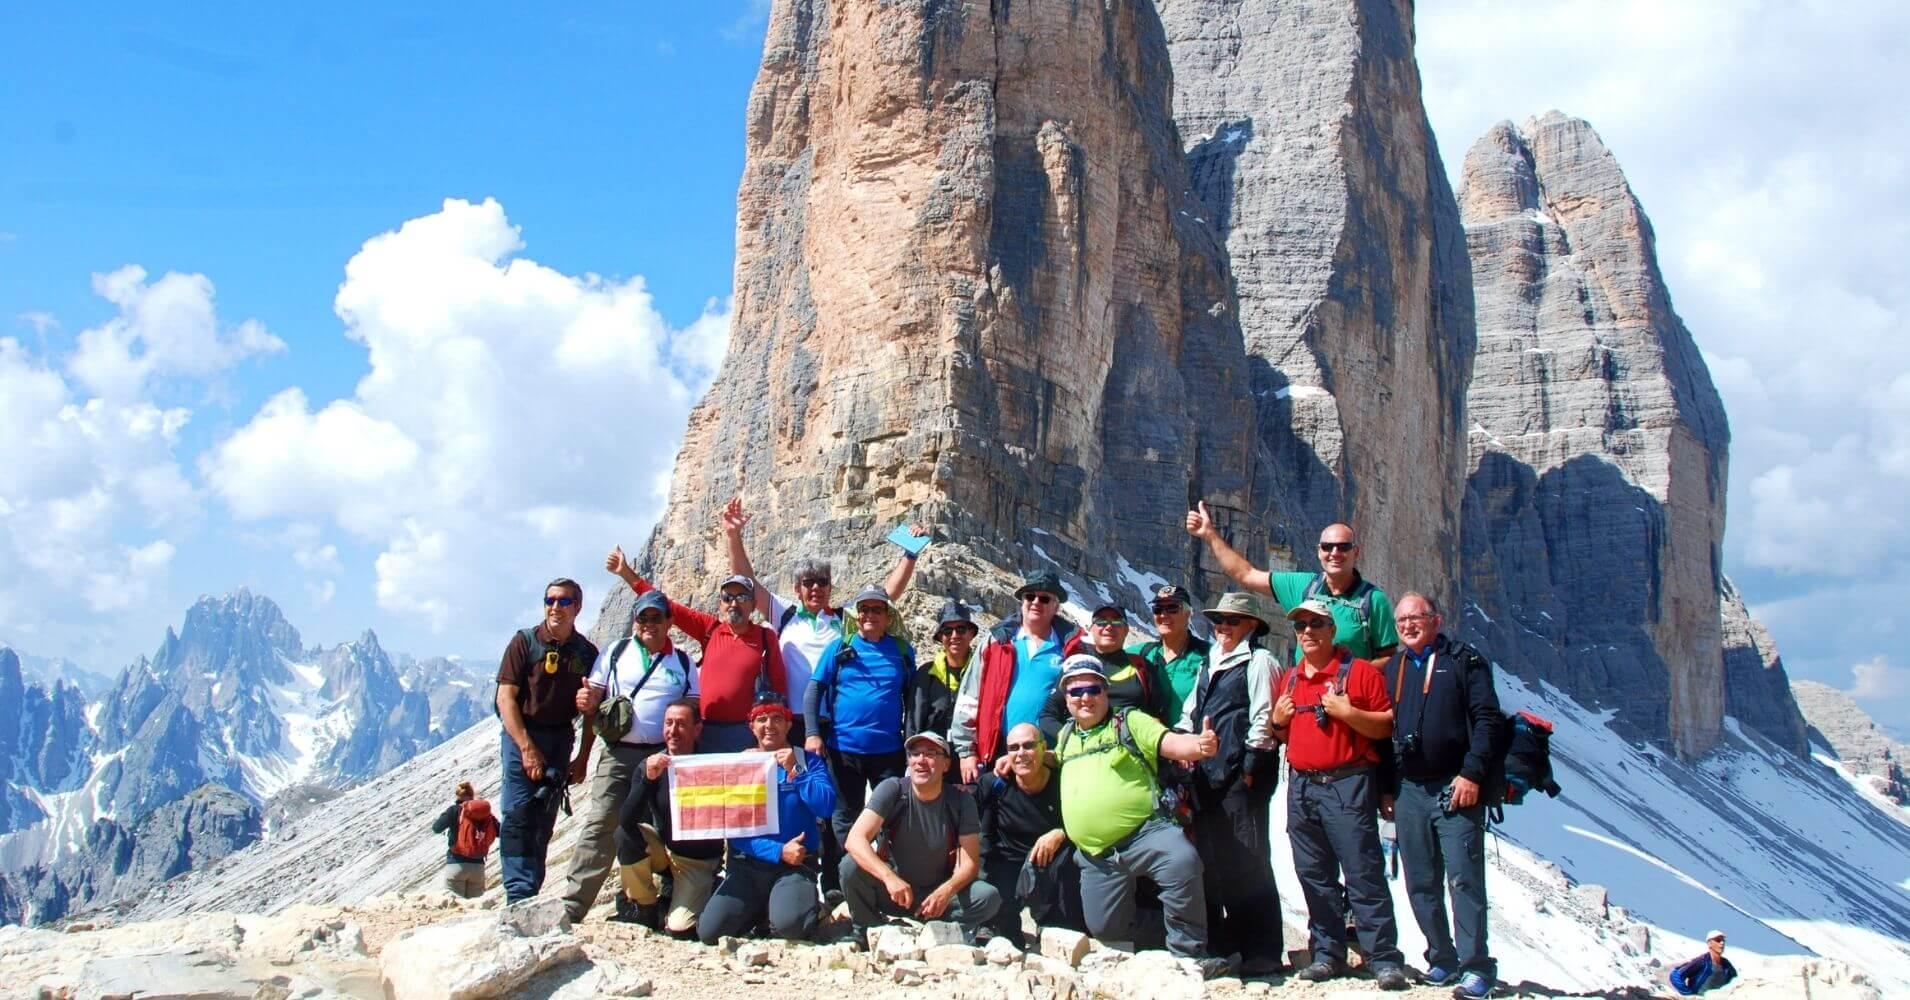 Grupo de Montaña Santo Tomé. Alpes Dolomitas. Belluno. Véneto. Italia.